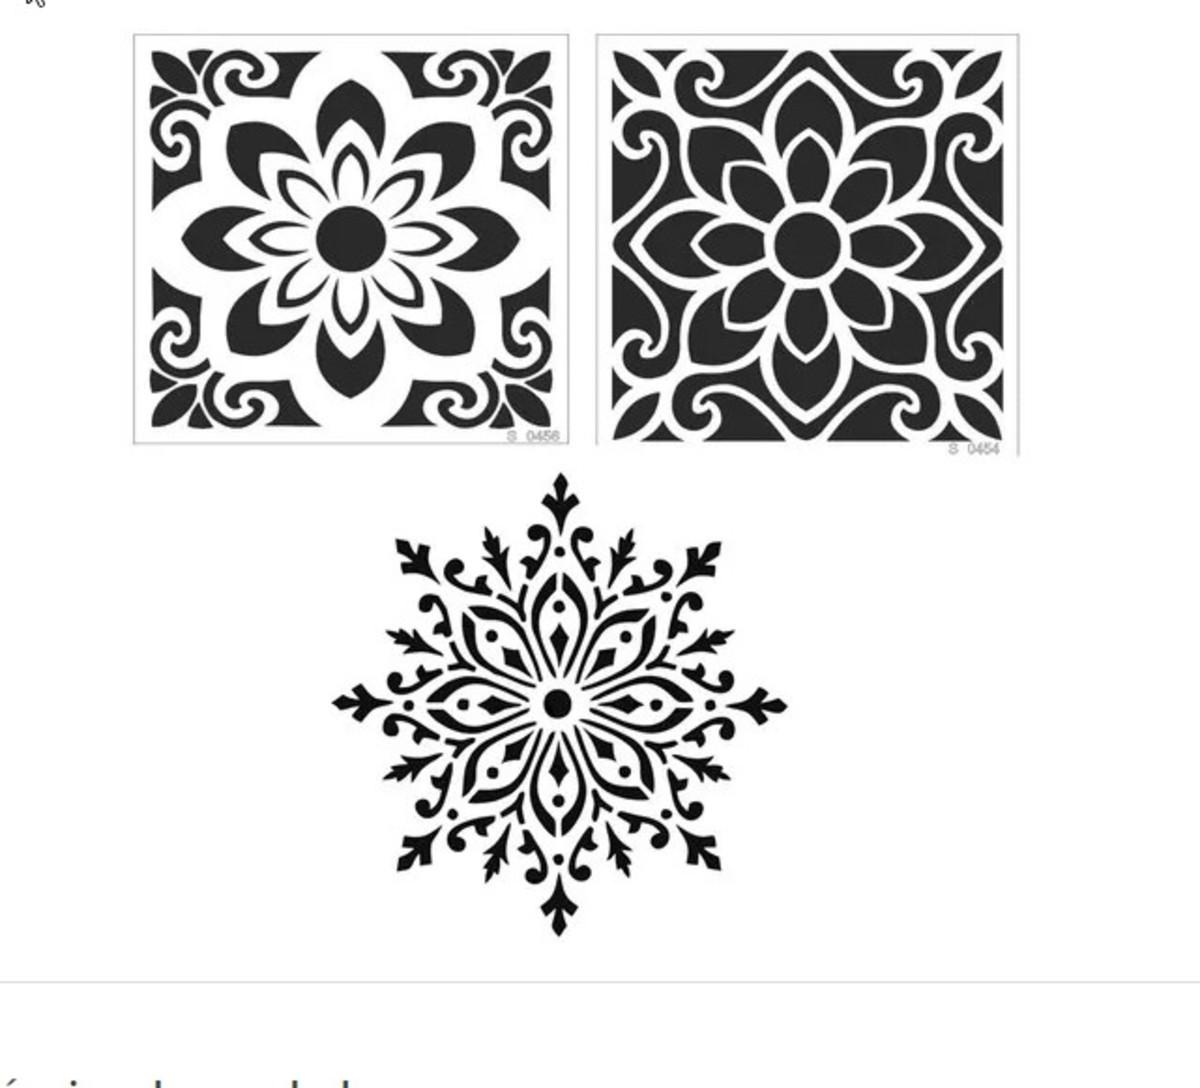 3 Stencil Molde Vazado Mosaico Mandala Pintura No Elo7 Submoda